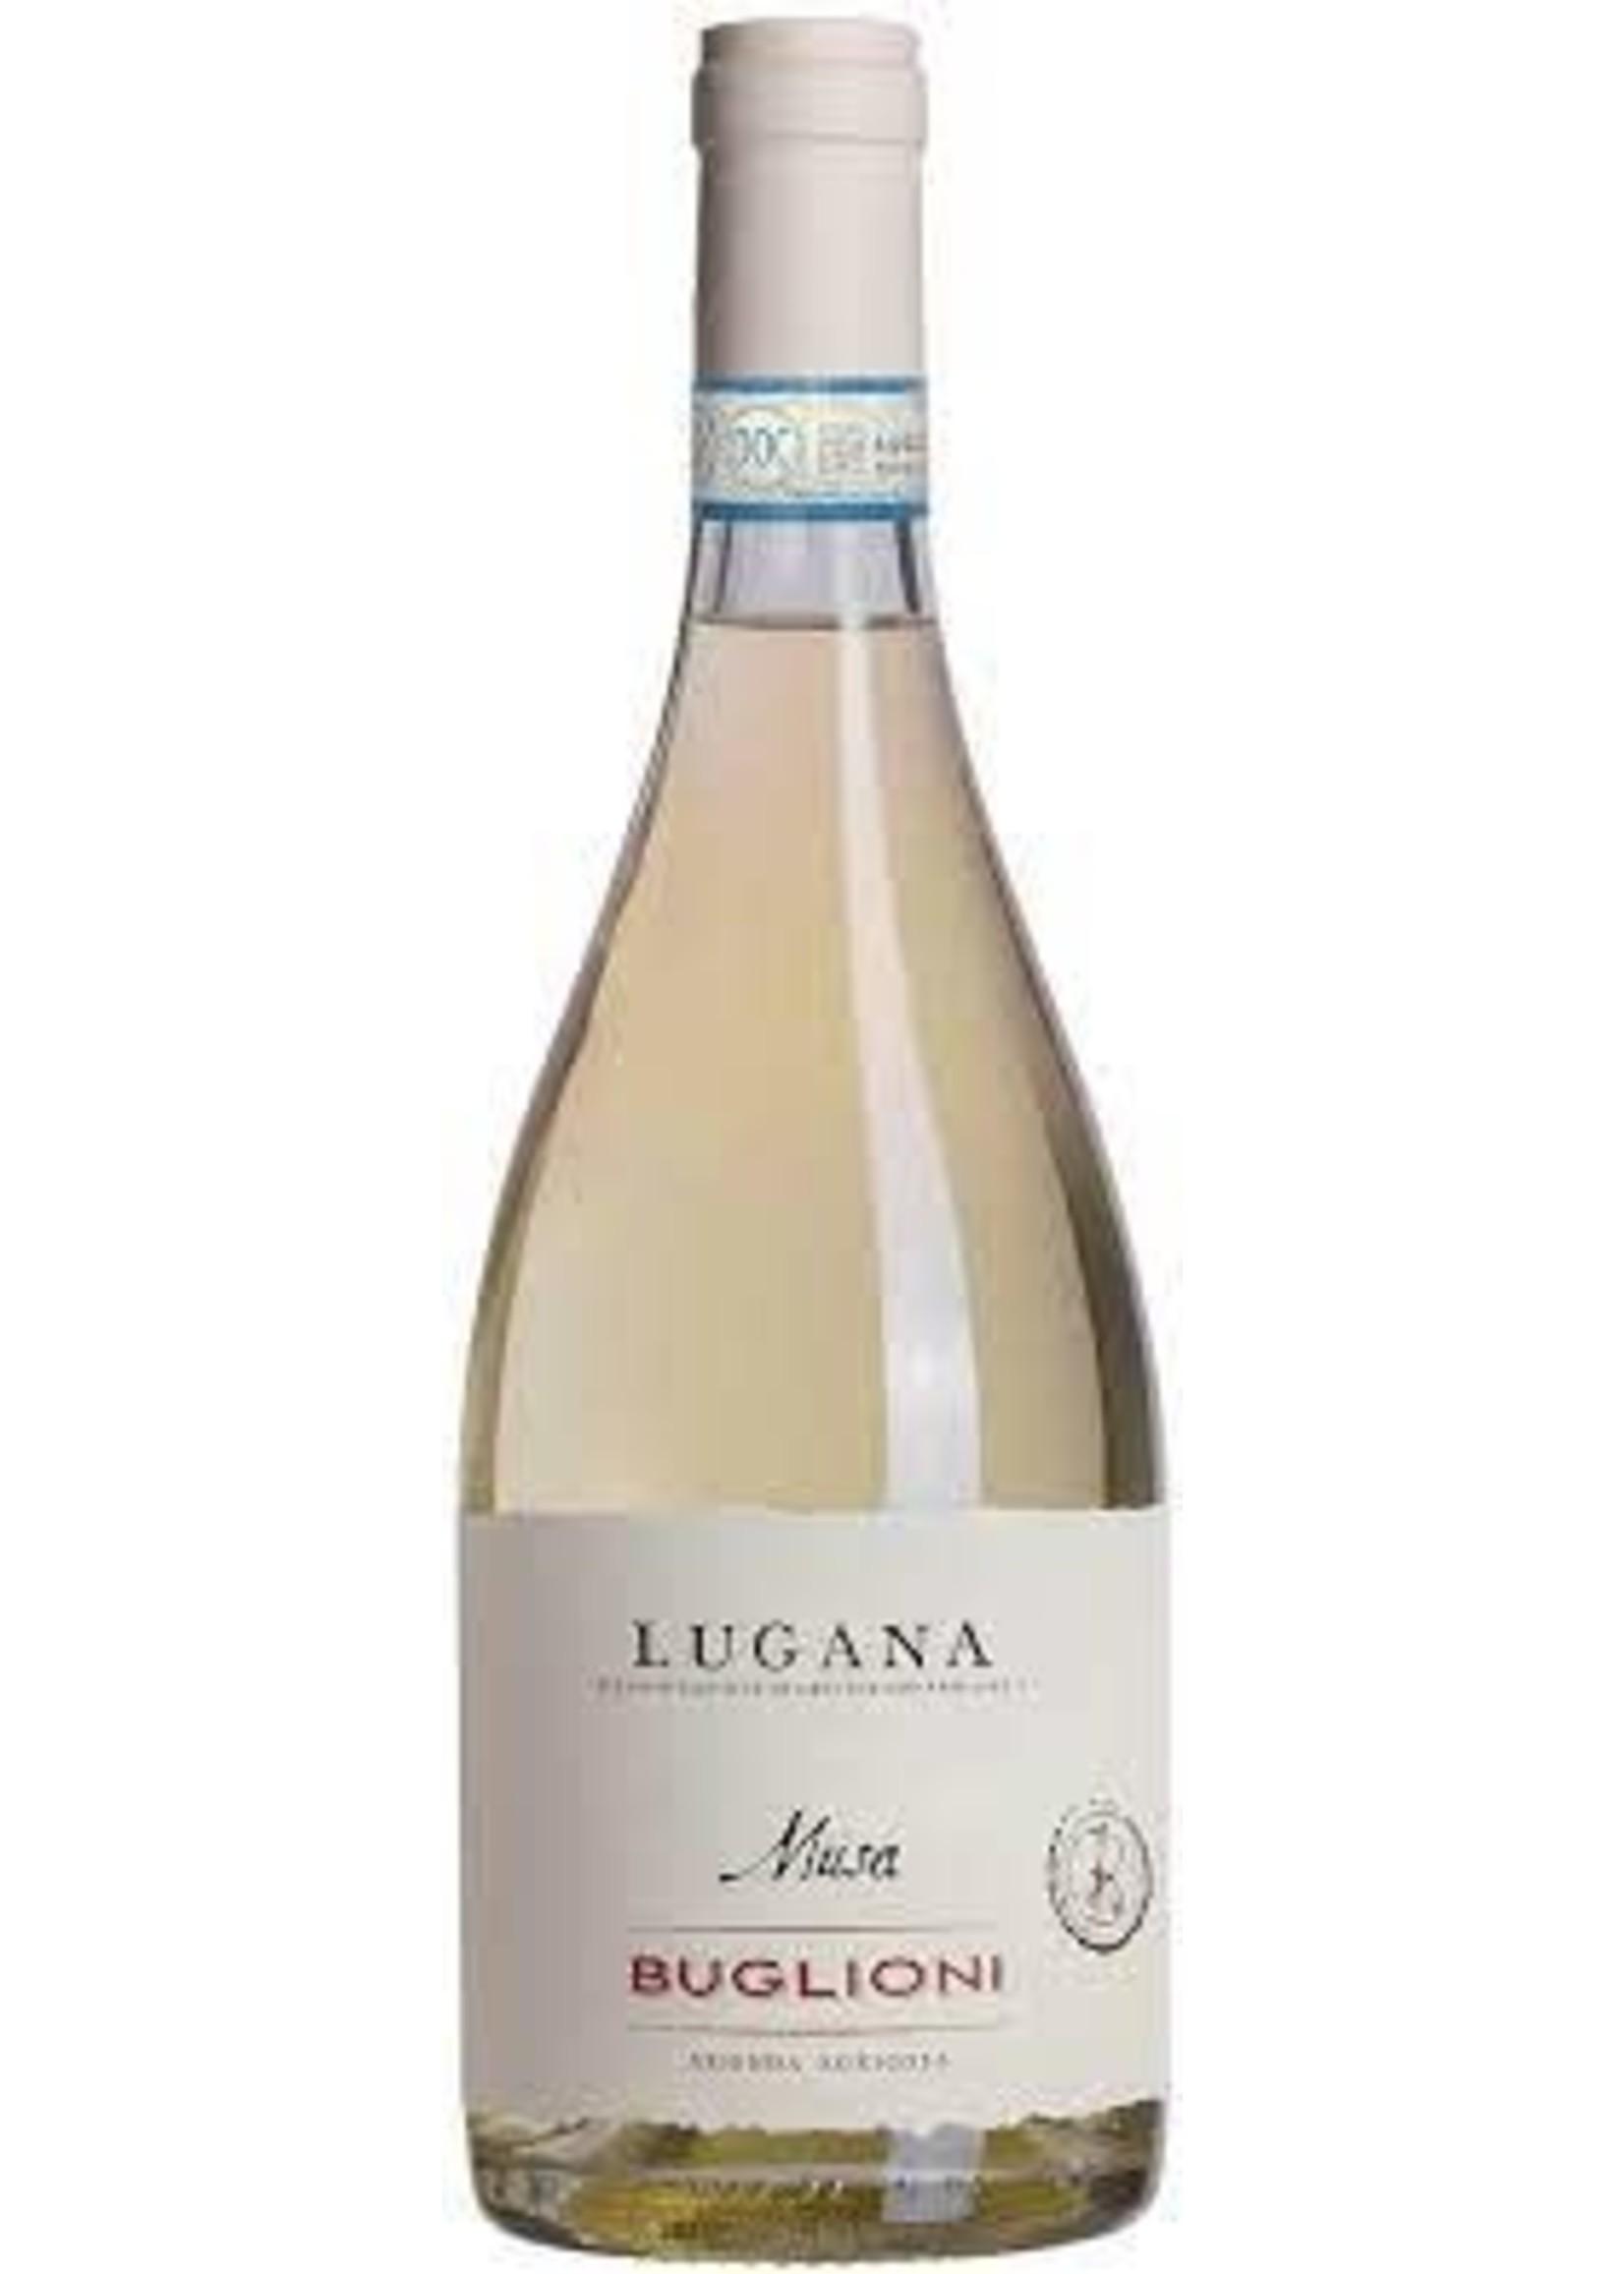 Buglioni 2018 Lugana Bianco750ml